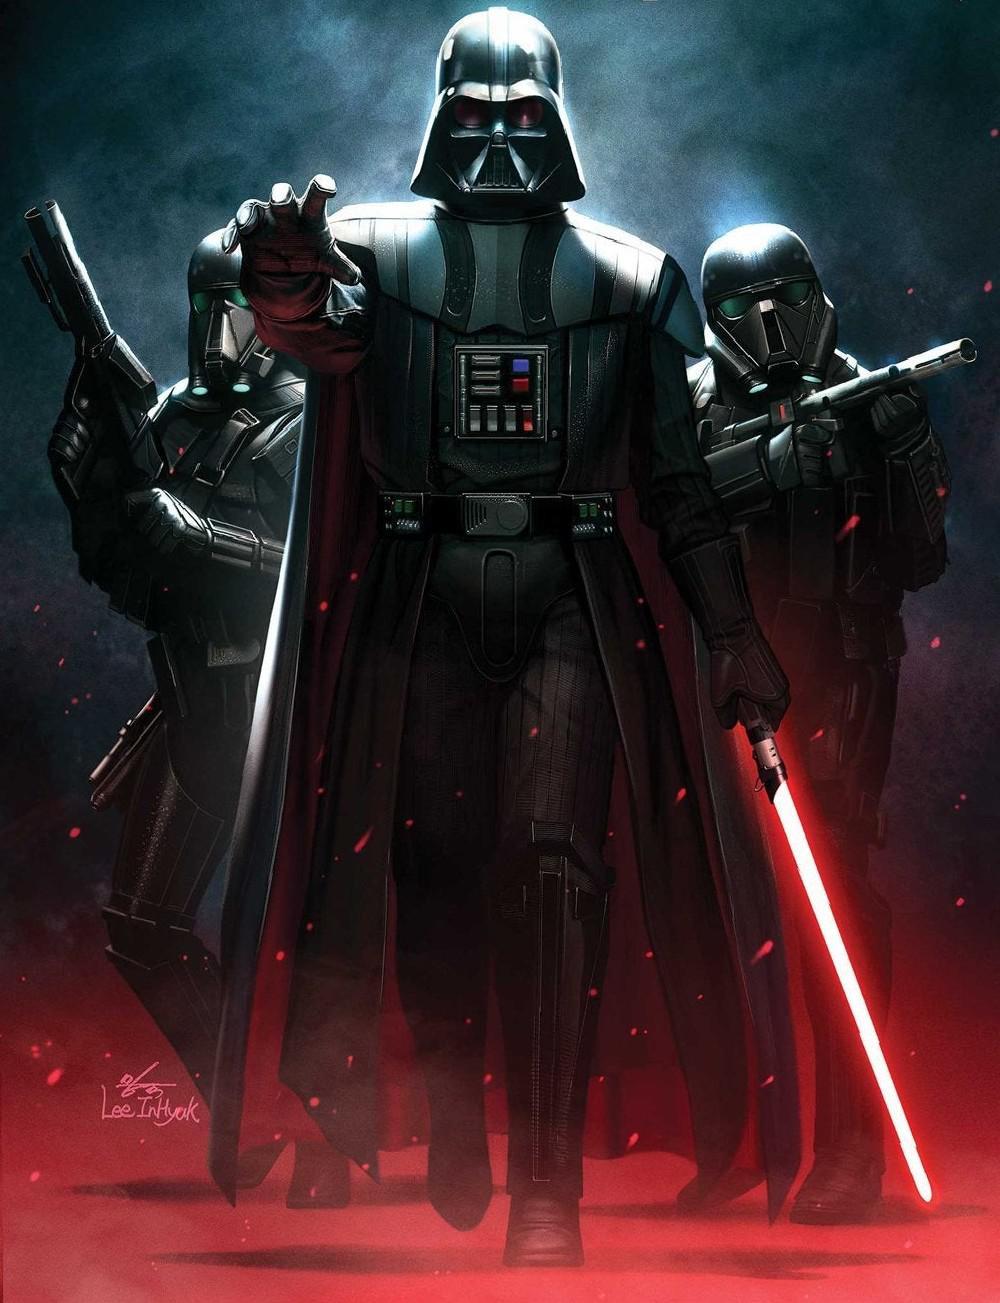 Free Download Darth Vader Wallpaper Starwars 1000x1303 For Your Desktop Mobile Tablet Explore 55 Cool Darth Vader Wallpapers Cool Darth Vader Wallpapers Darth Vader Wallpaper Darth Vader Background